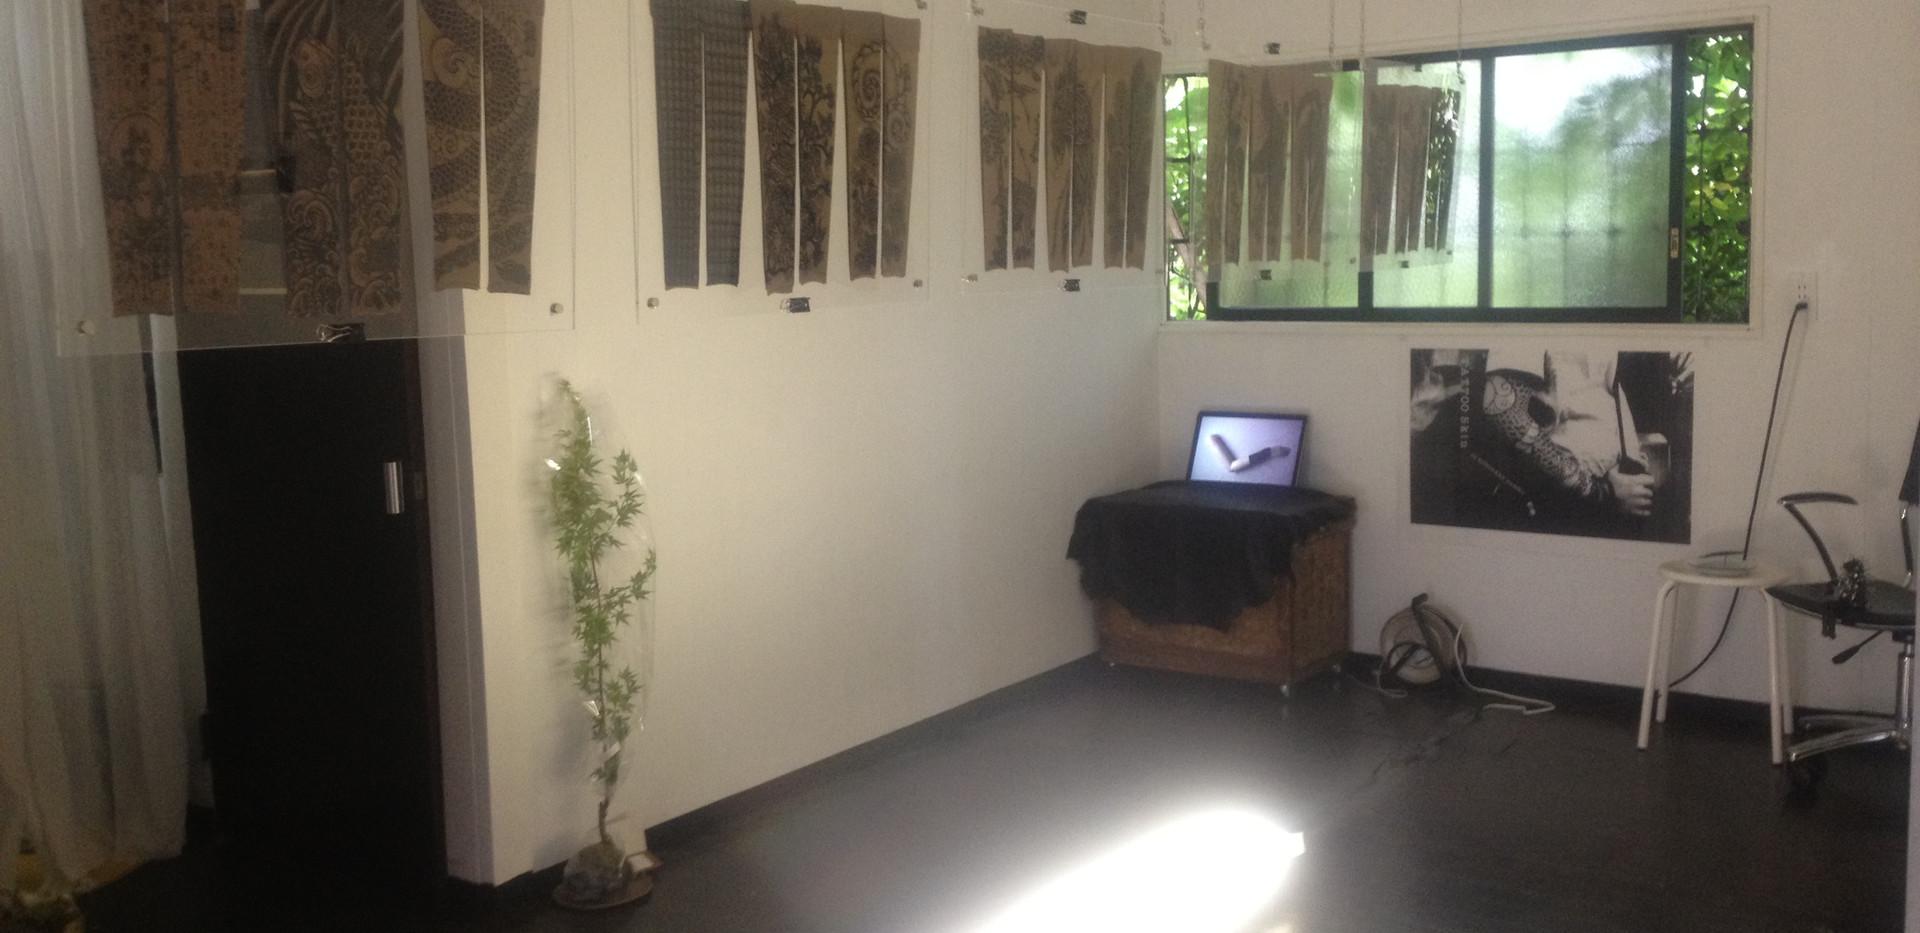 「TATTOO Skin」展 HADA-Ka Studio OPEN@HADA-Ka Studio(東京)2012年